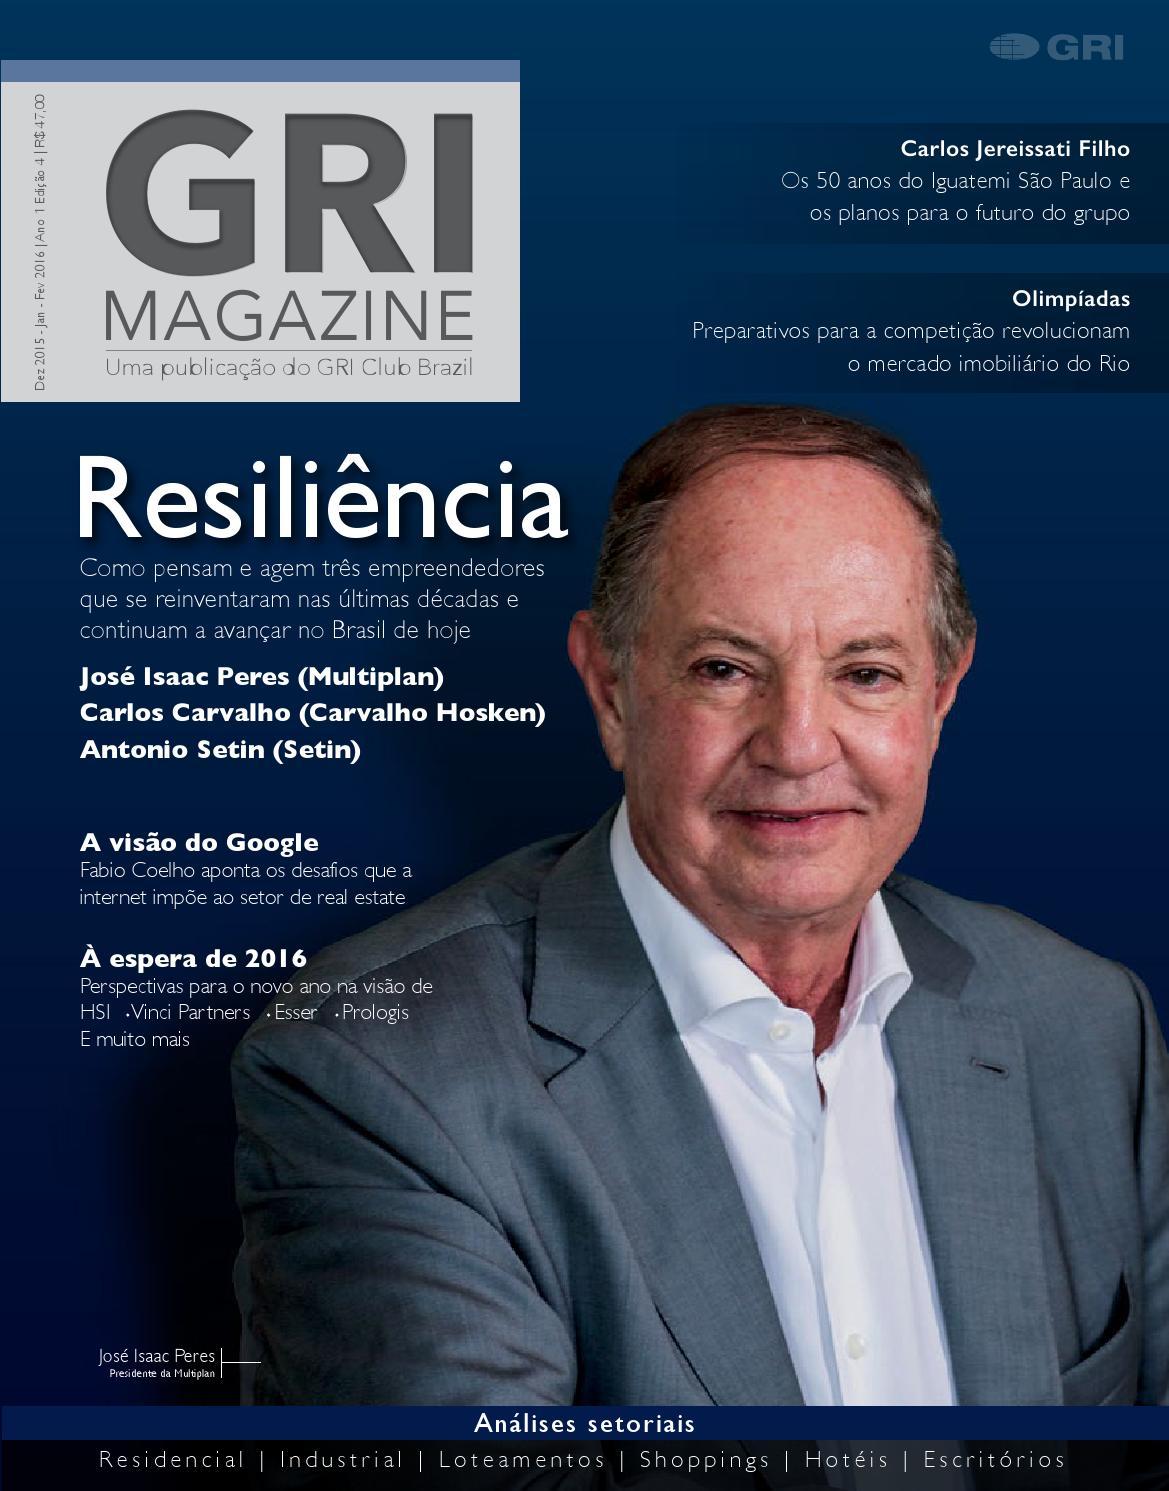 GRI Magazine 4ª Edição by GRI Club - issuu 476f4284ee